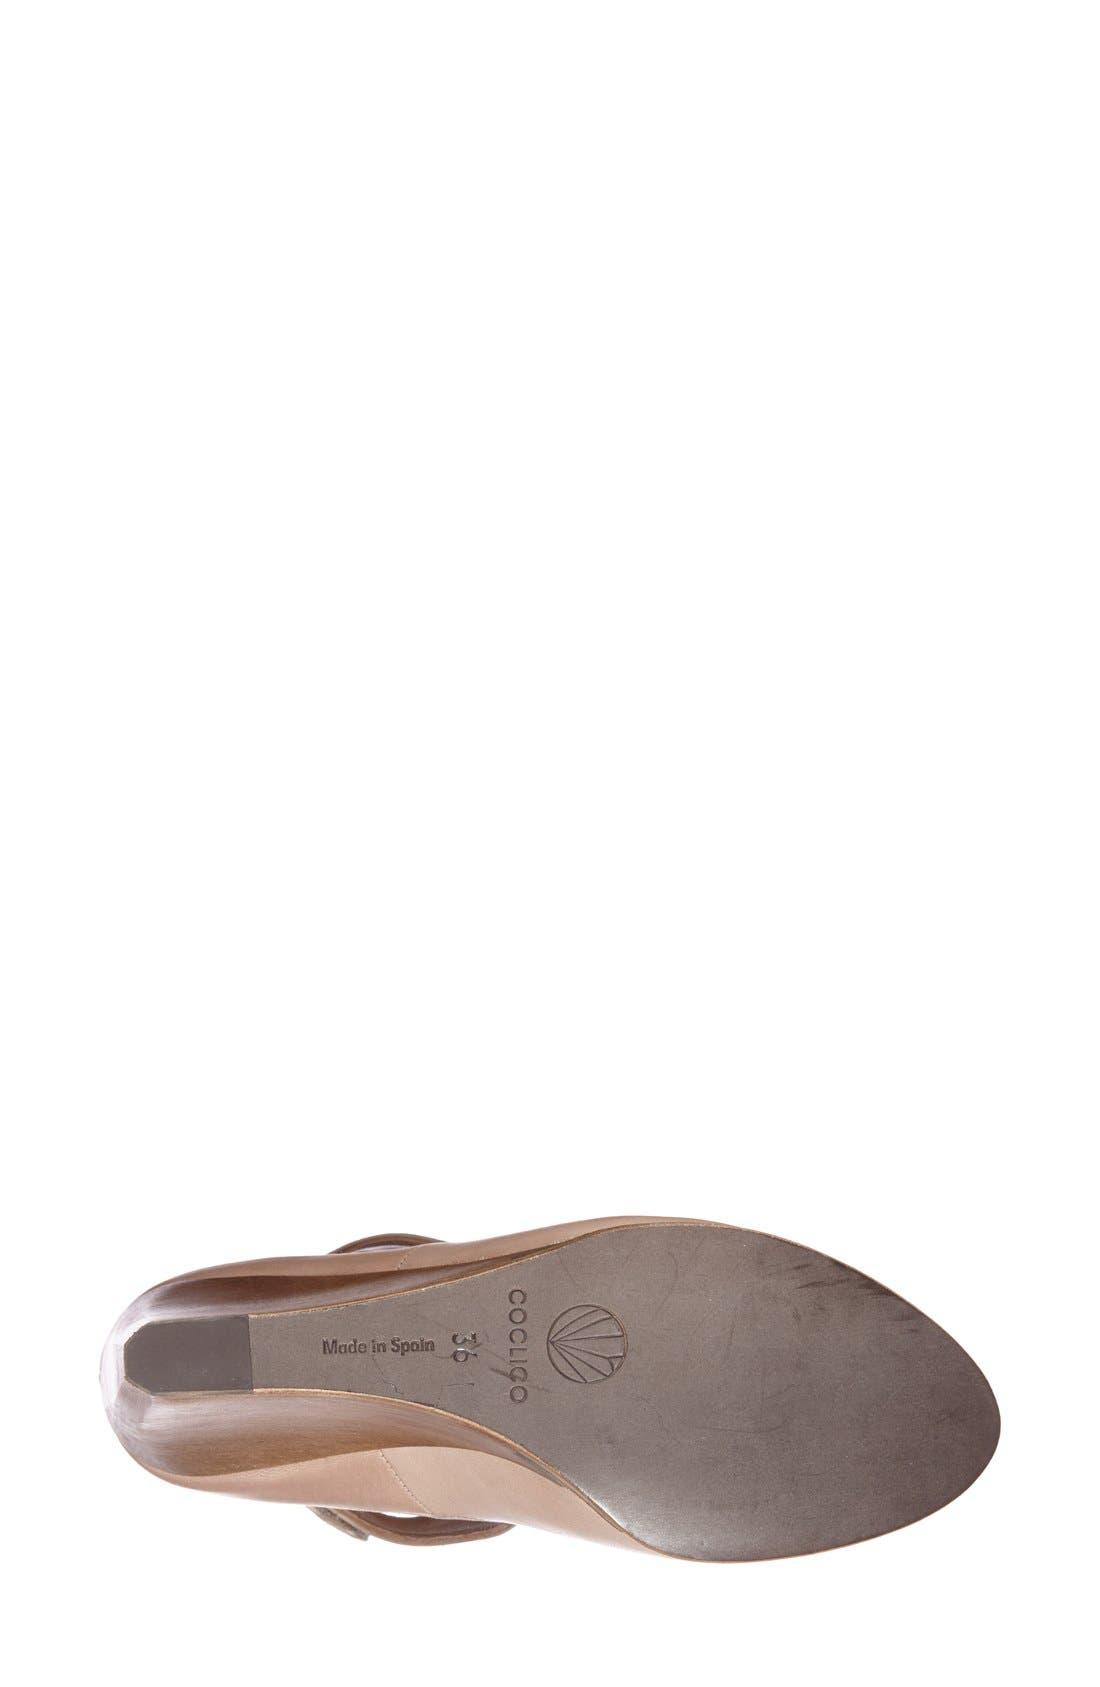 Alternate Image 4  - Coclico 'Jory' Cutout Leather Bootie (Women)